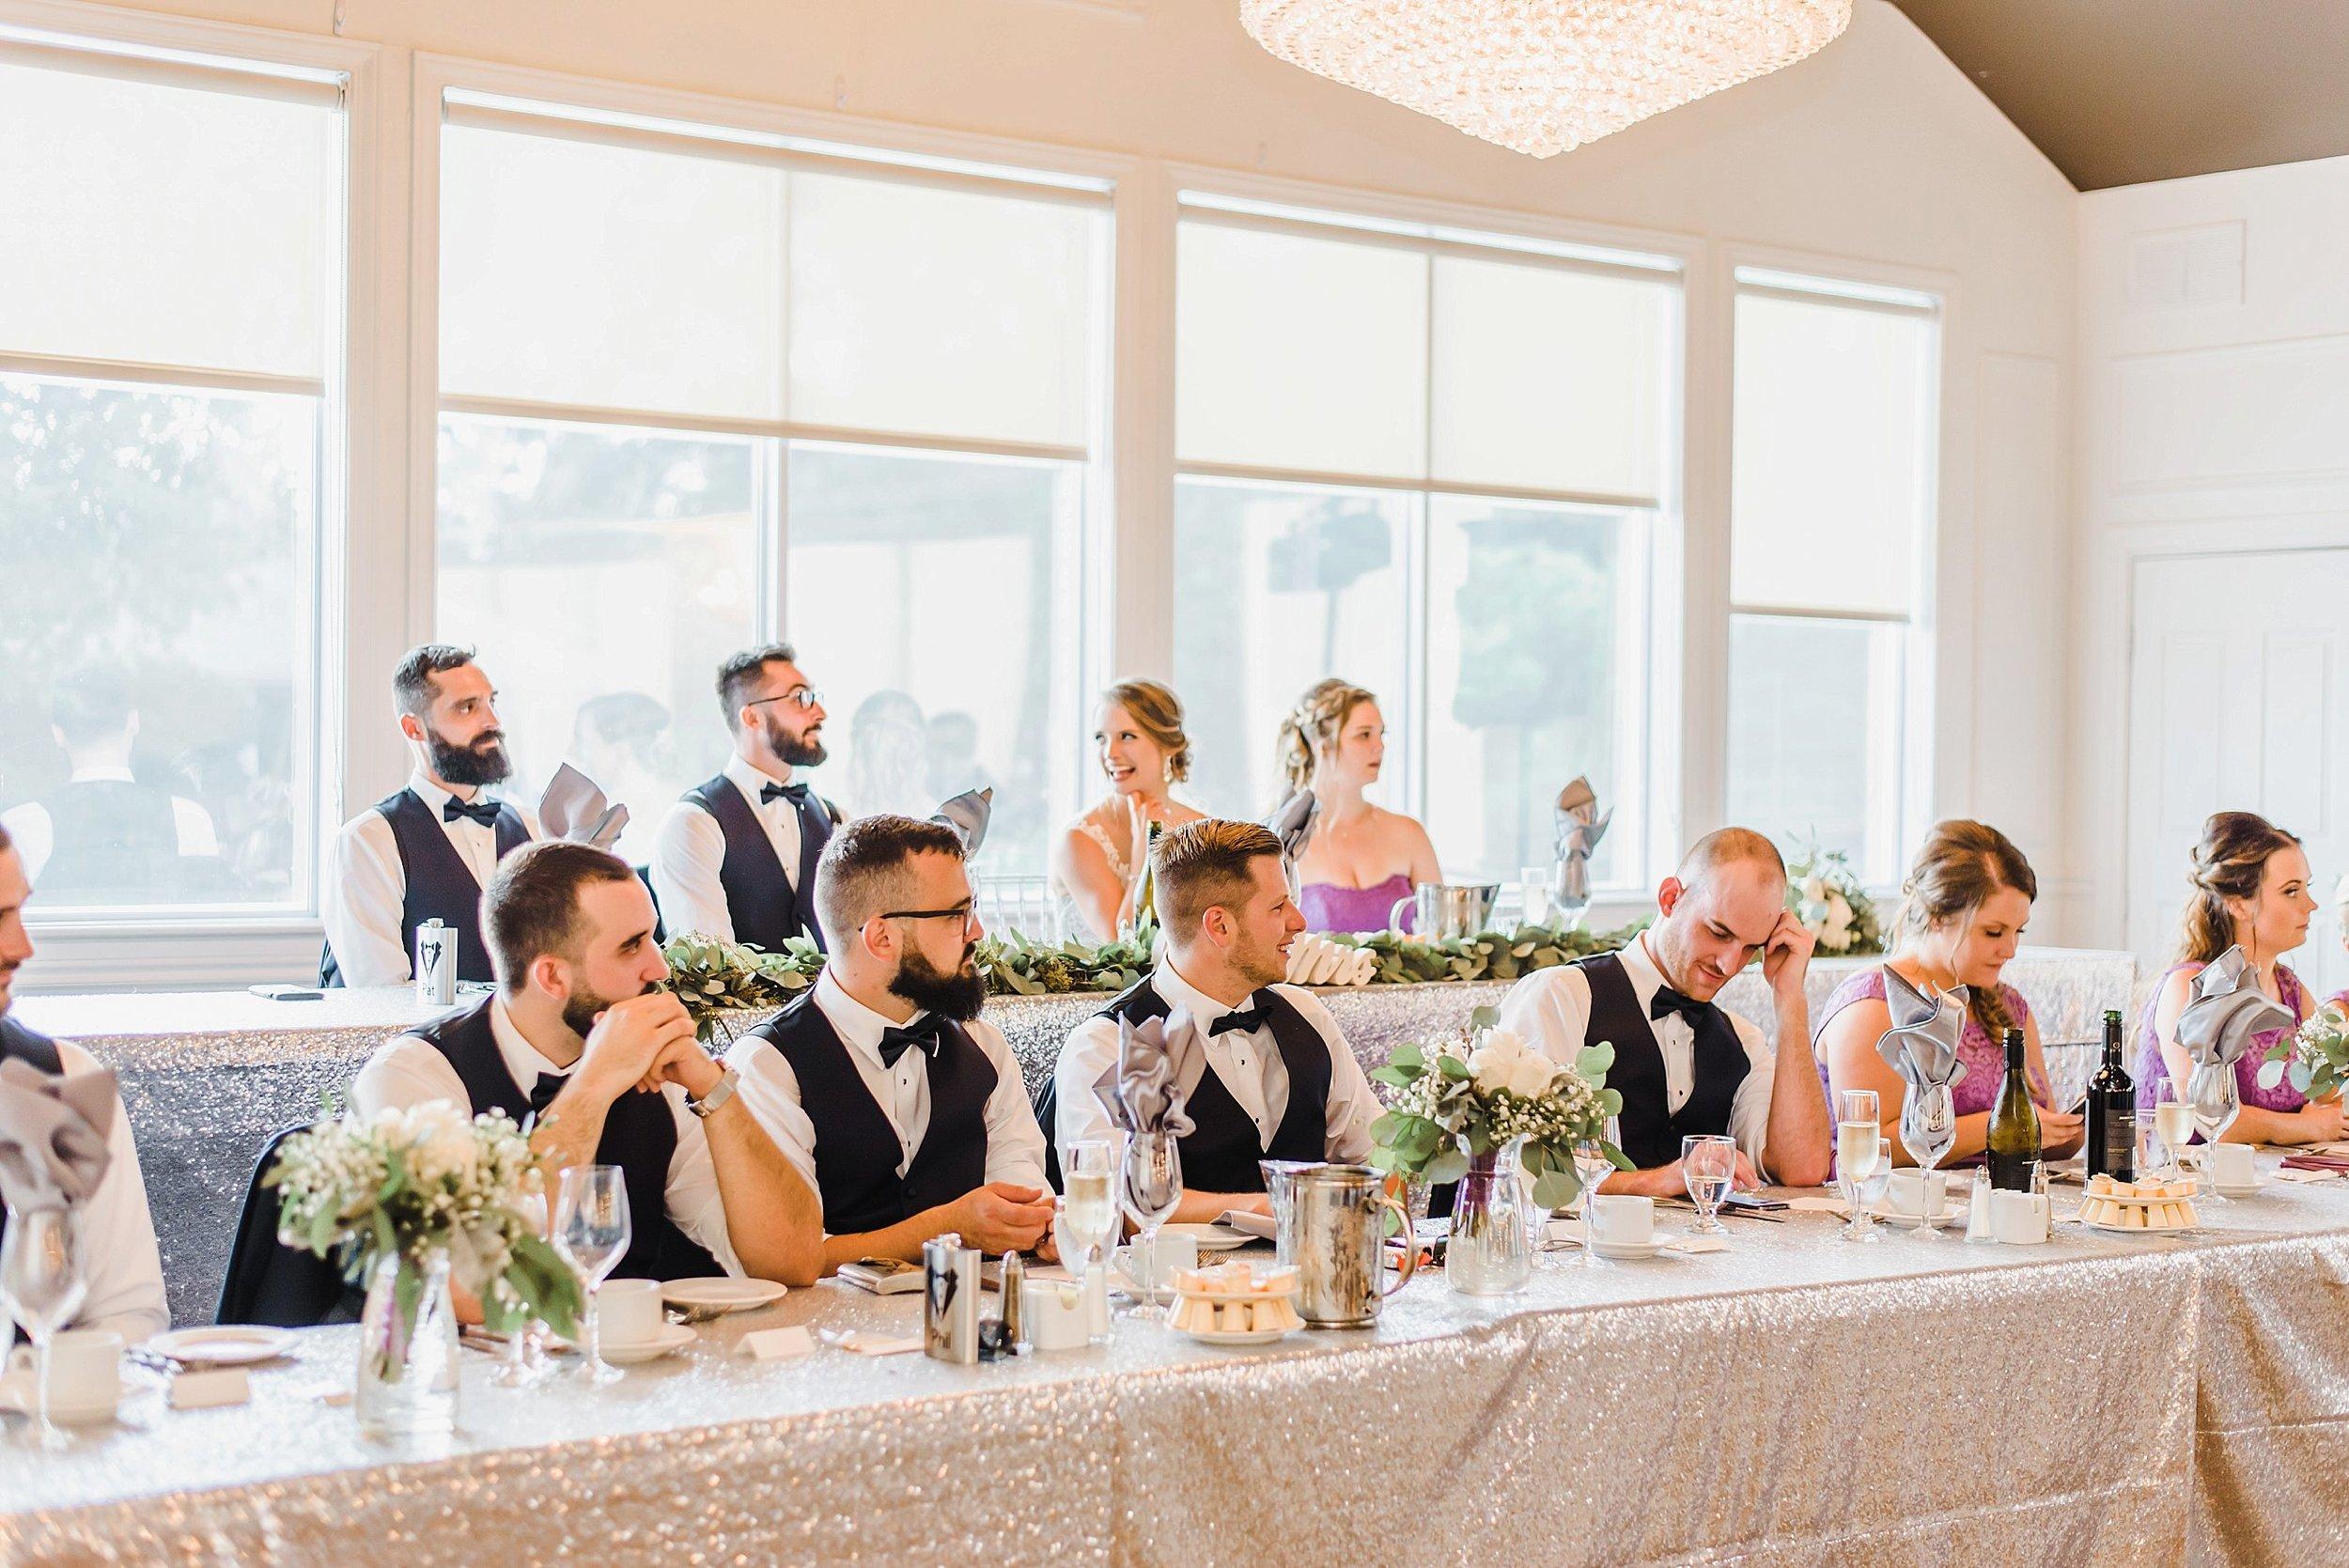 light airy indie fine art ottawa wedding photographer | Ali and Batoul Photography_1338.jpg